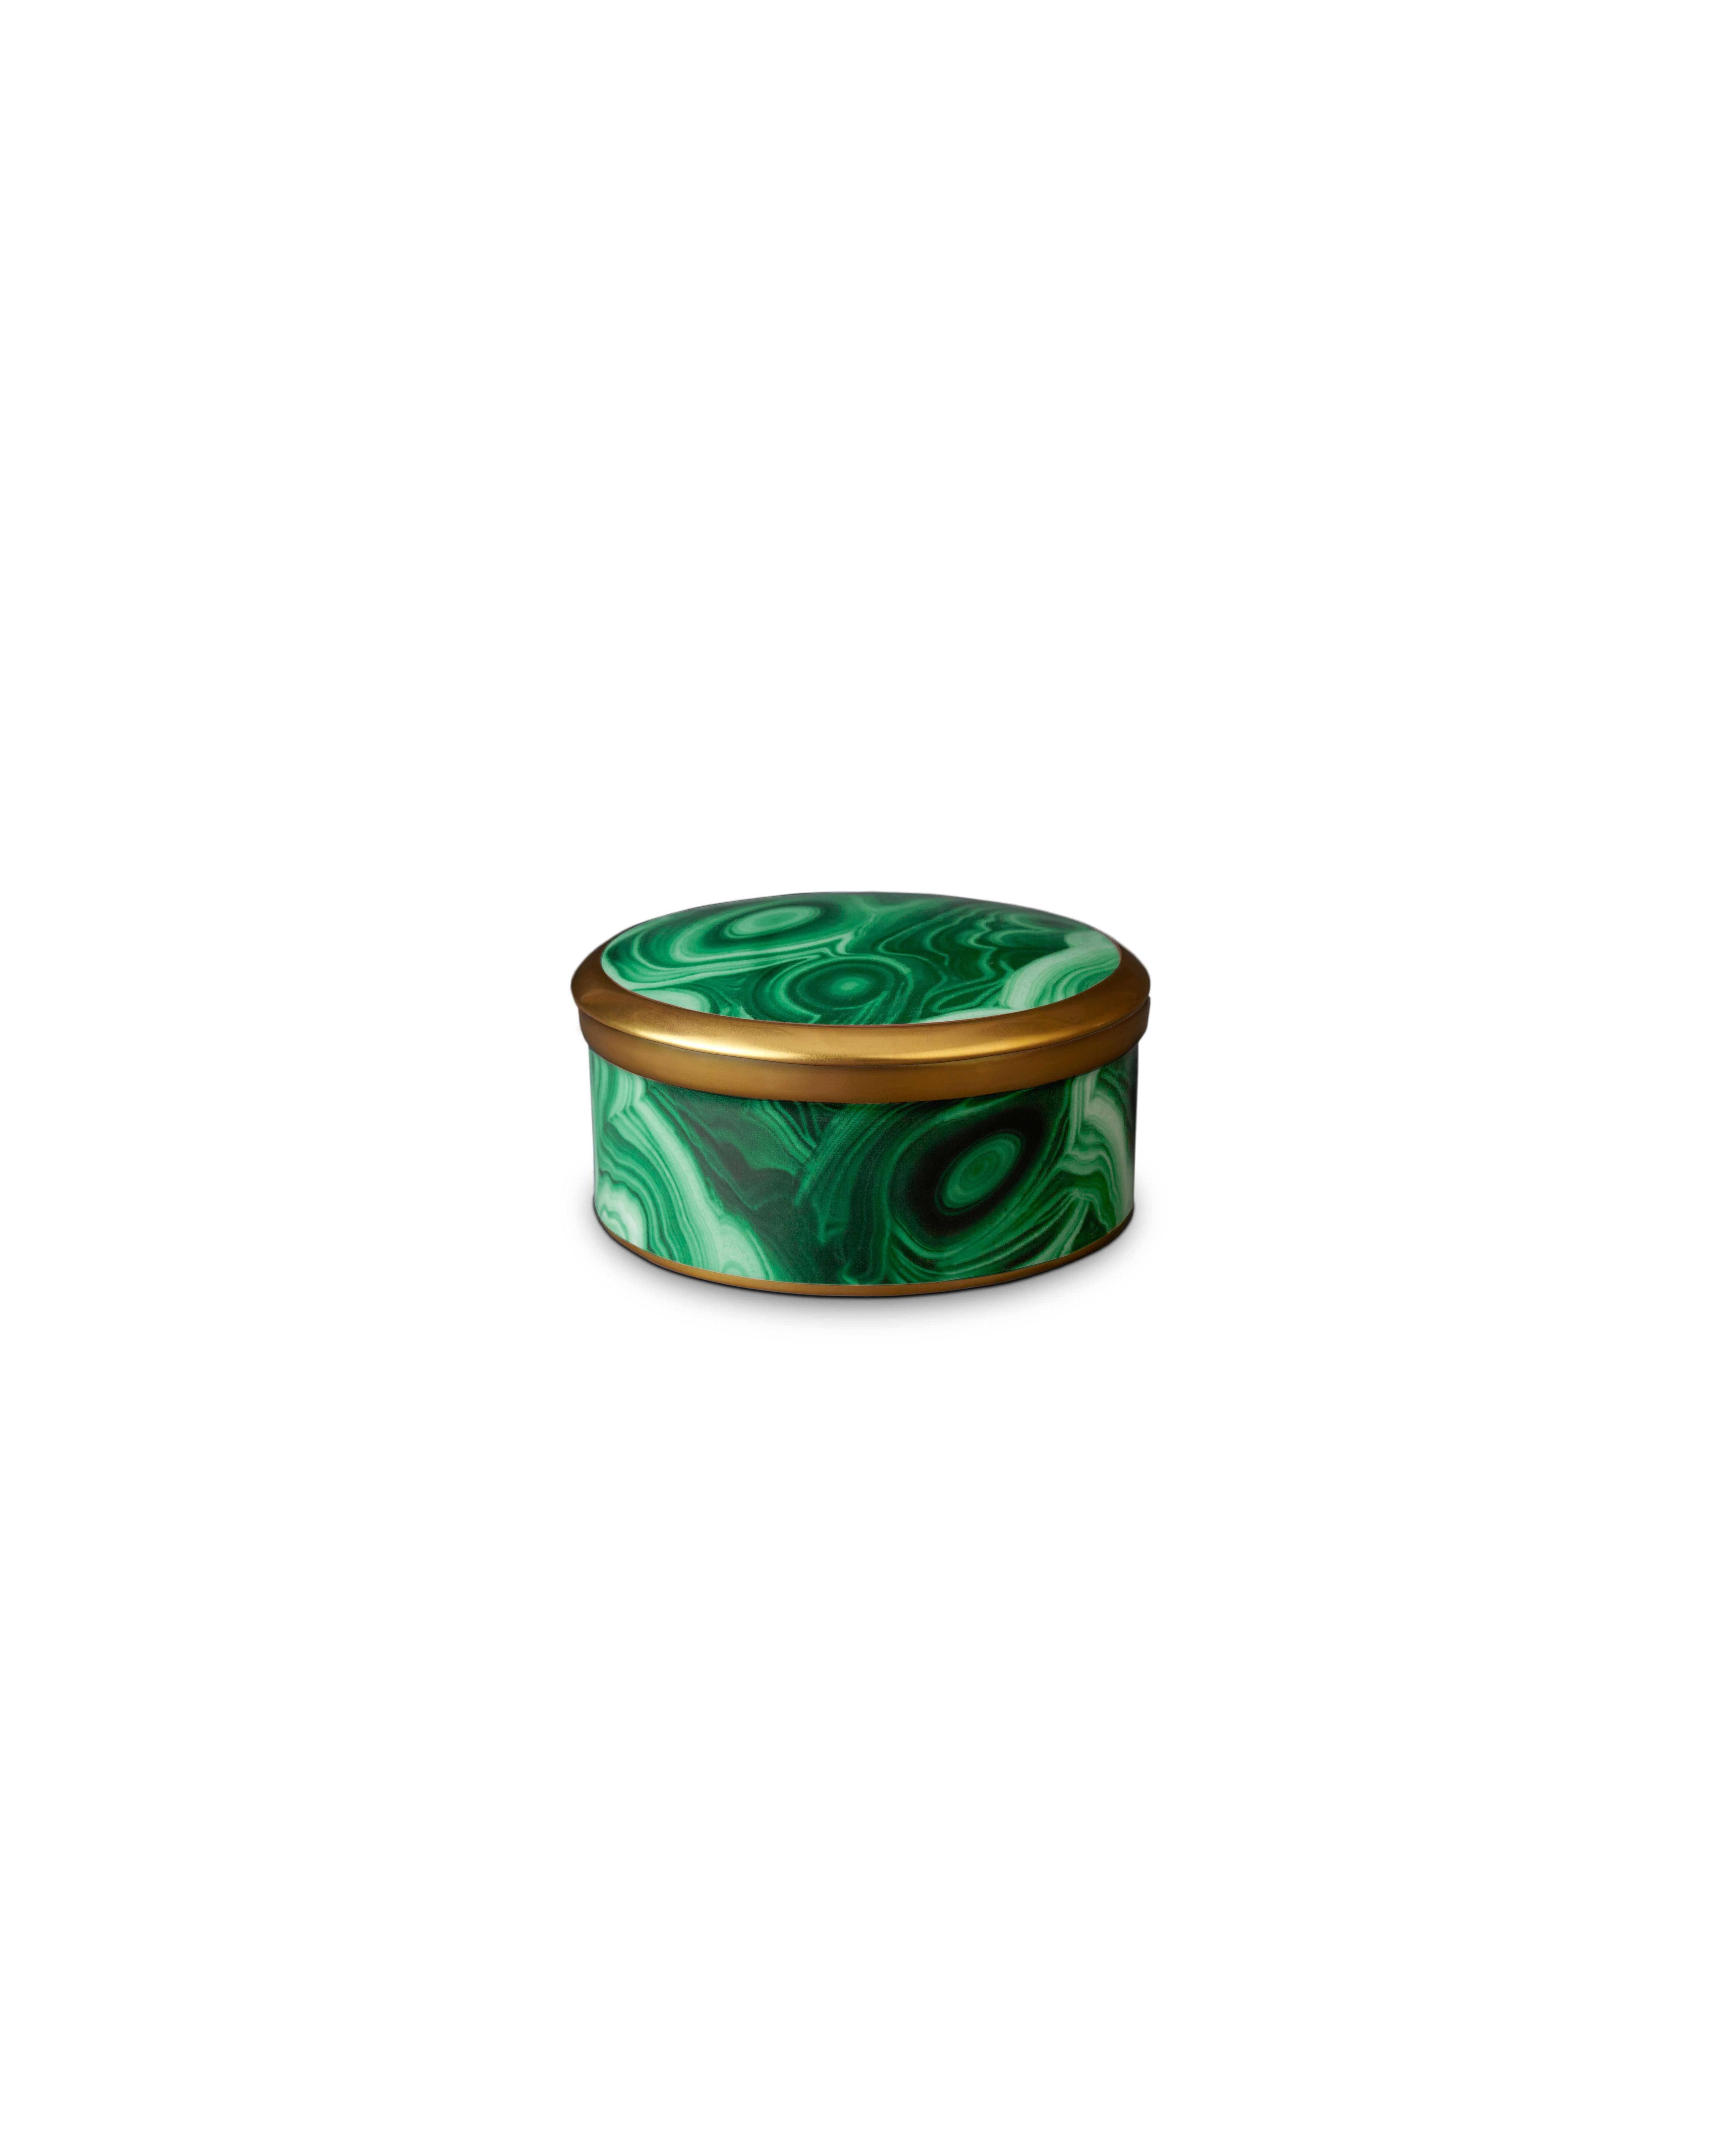 hollowware anniversary gifts malachite round box lobjet